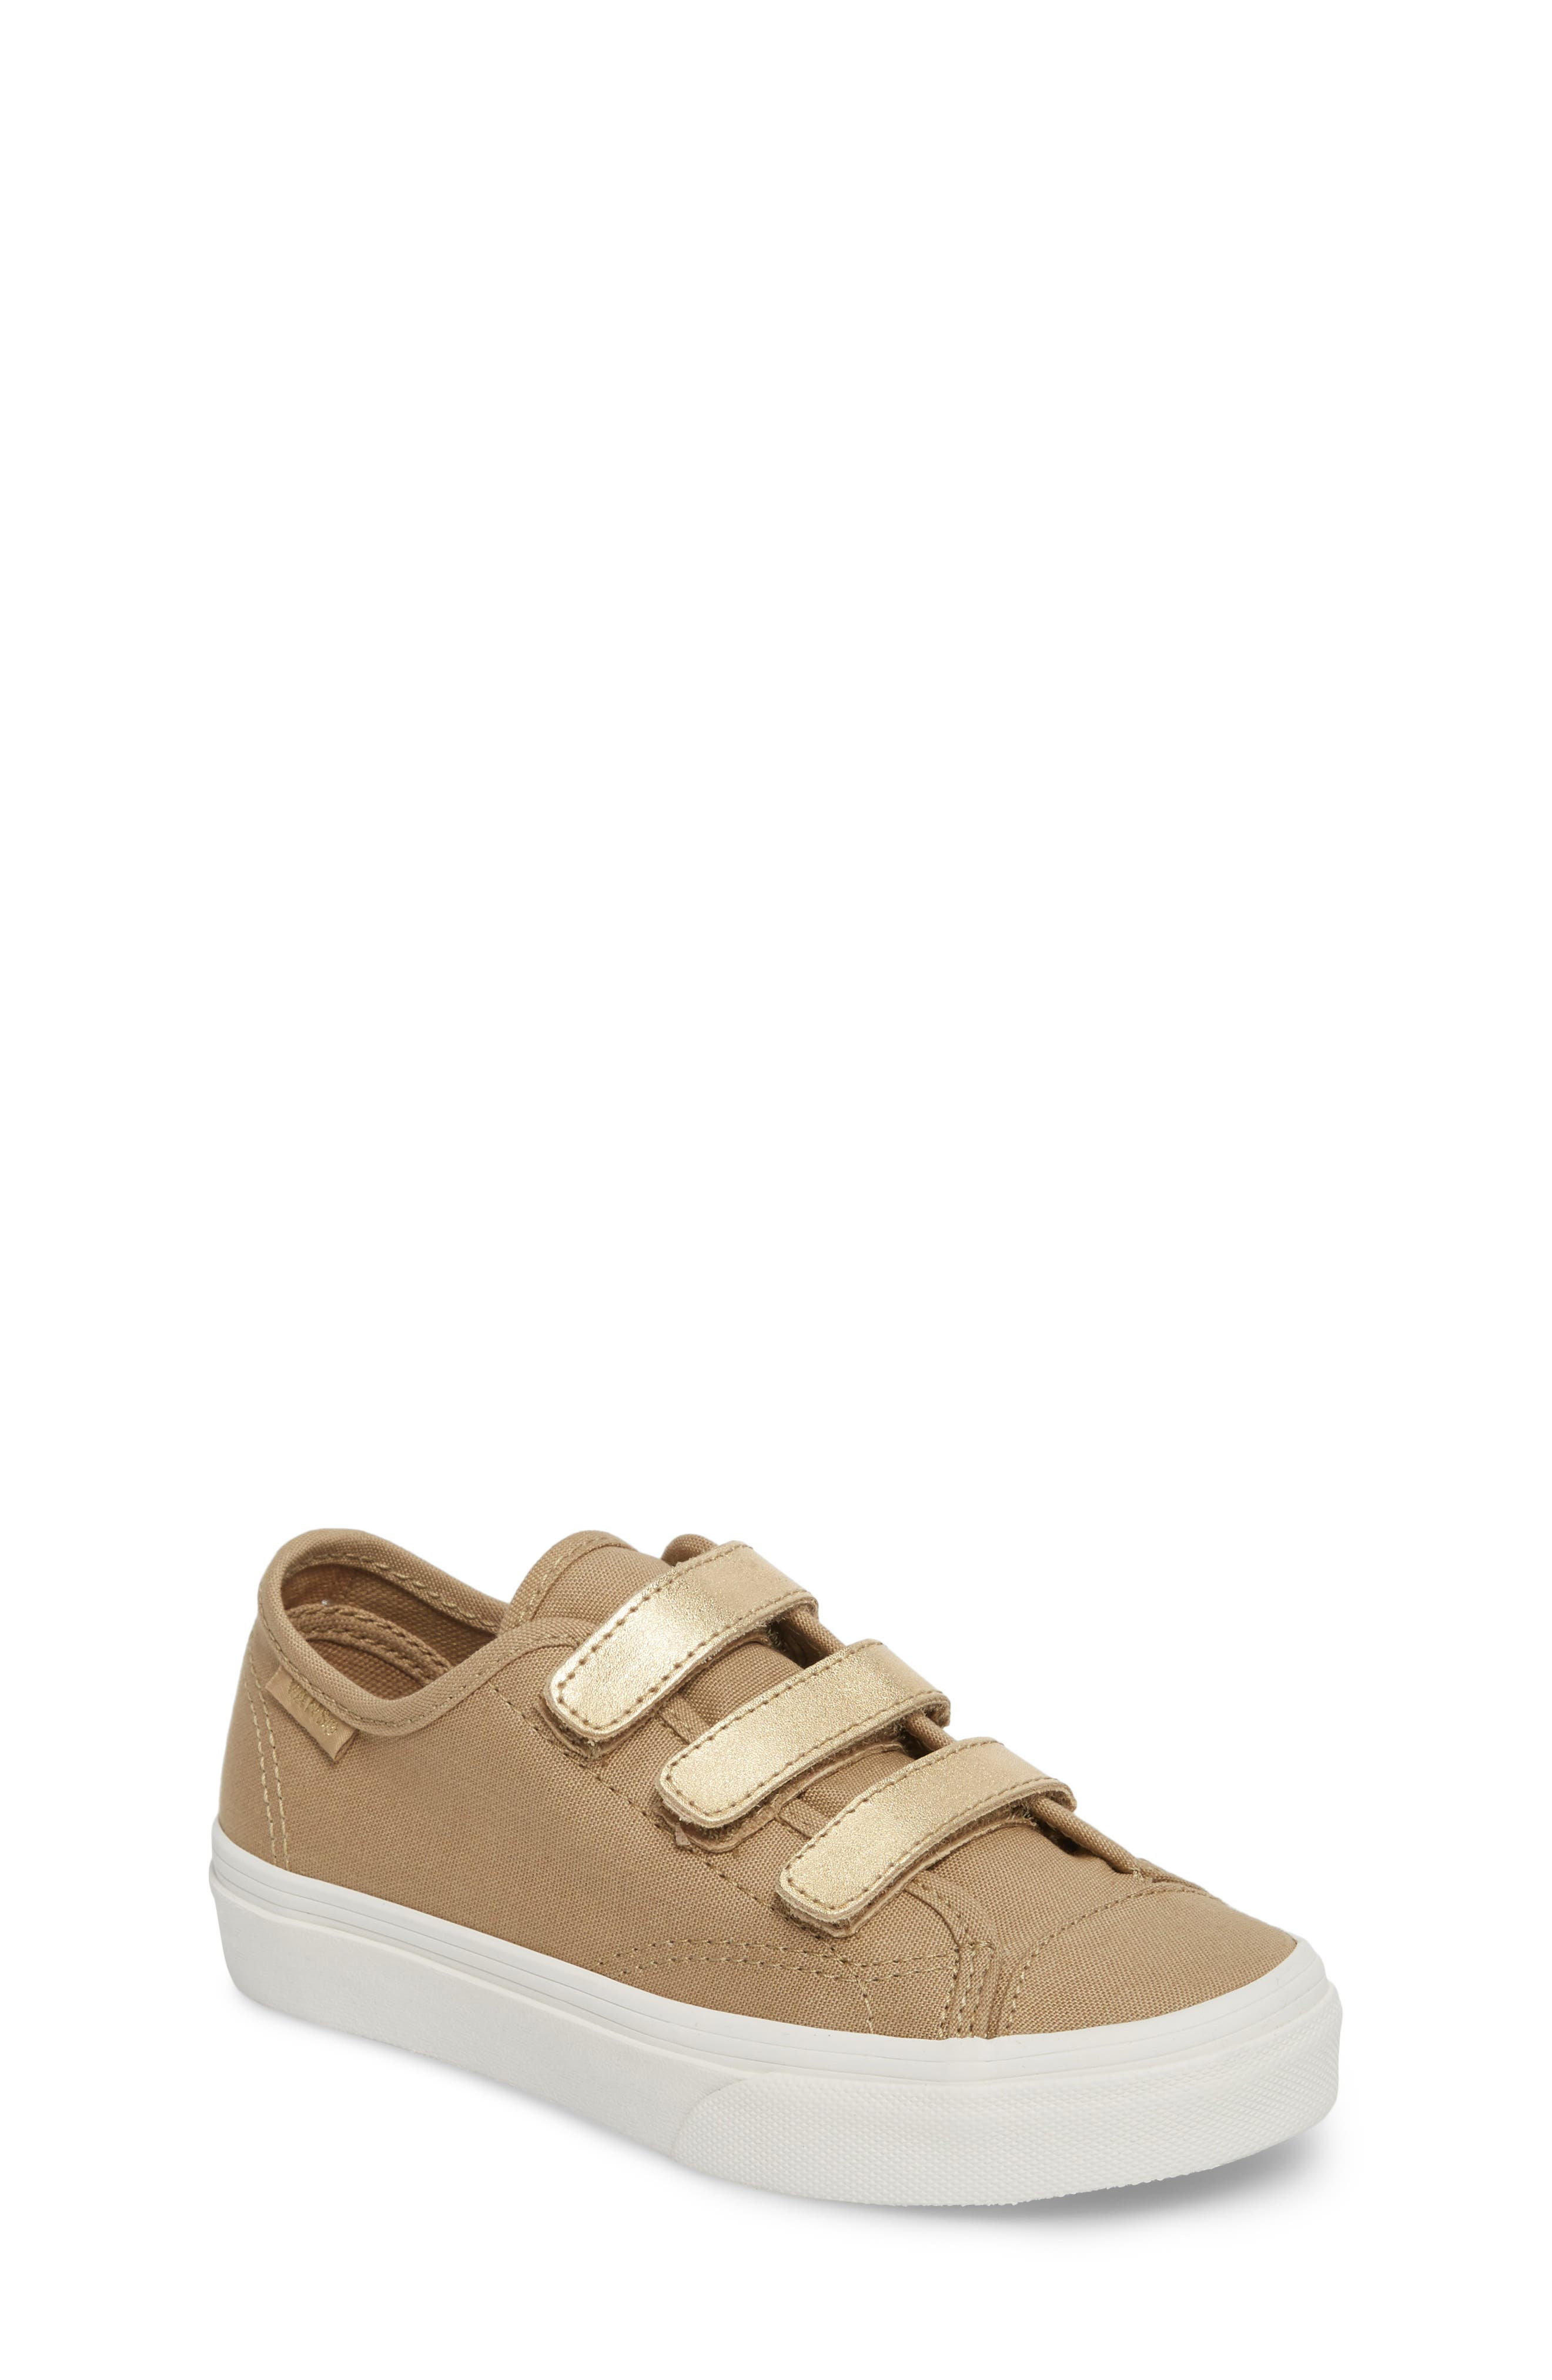 Style 23V Sneaker,                             Main thumbnail 1, color,